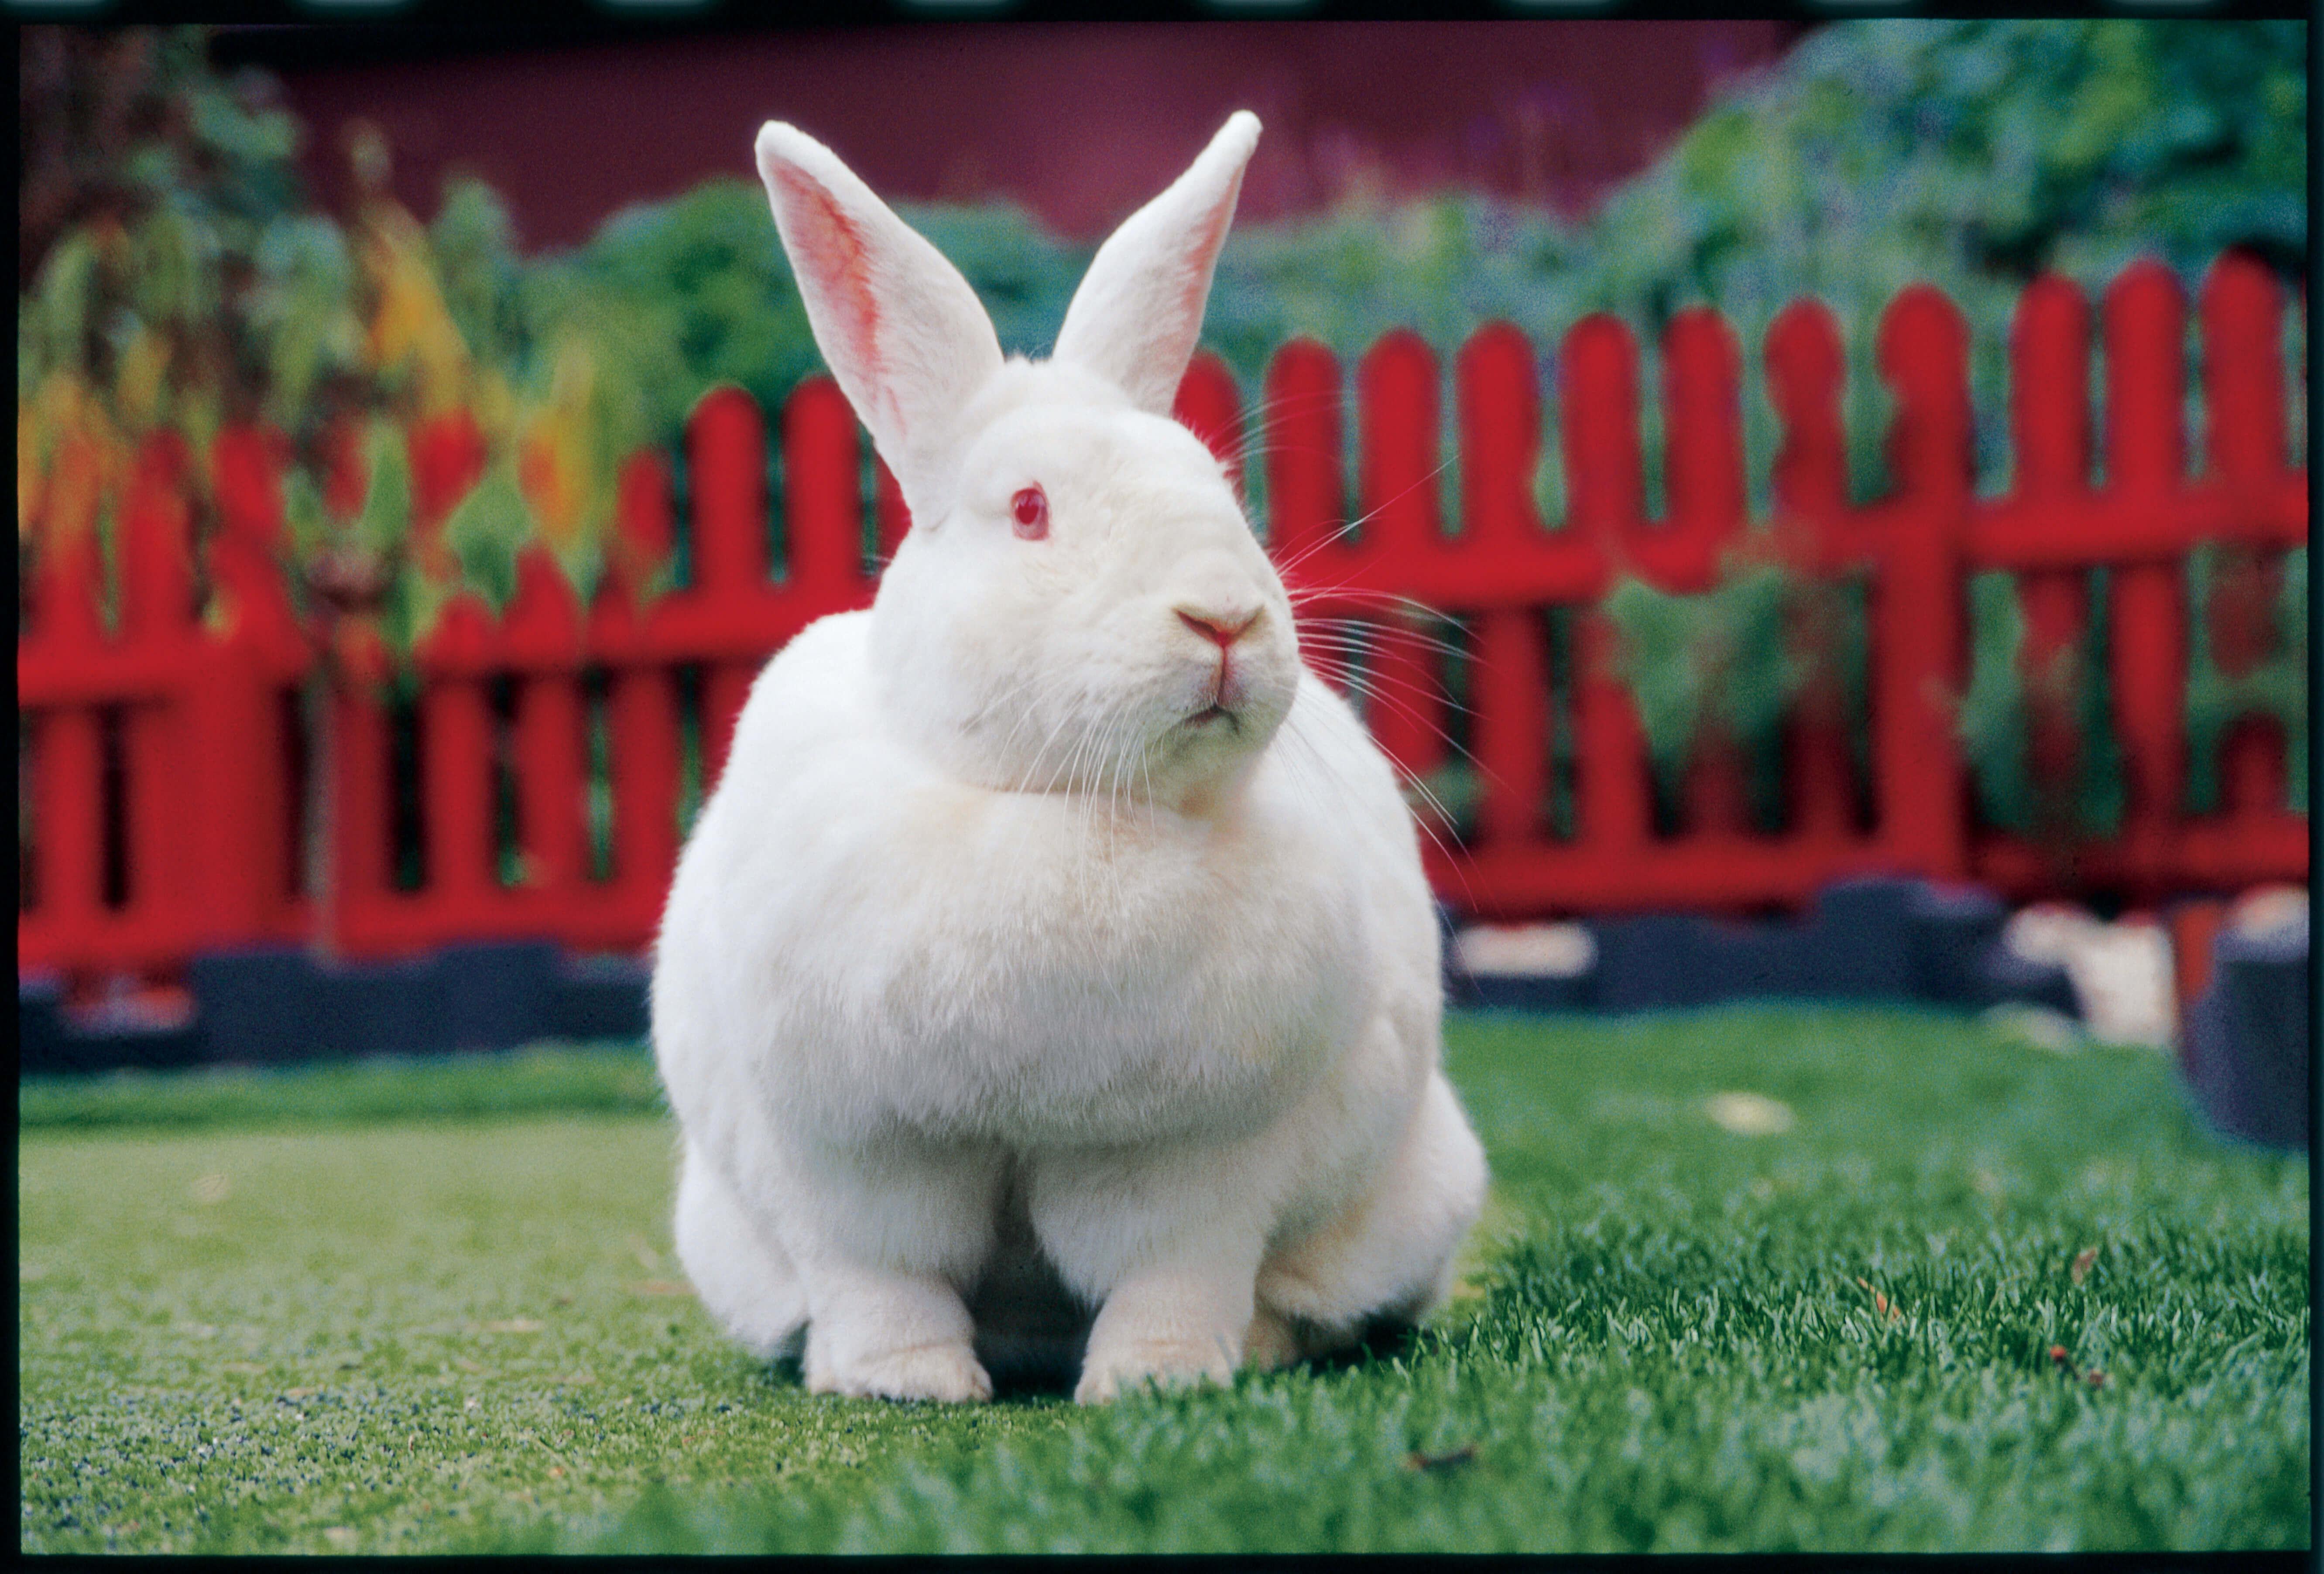 cosmetic testing ban on animals